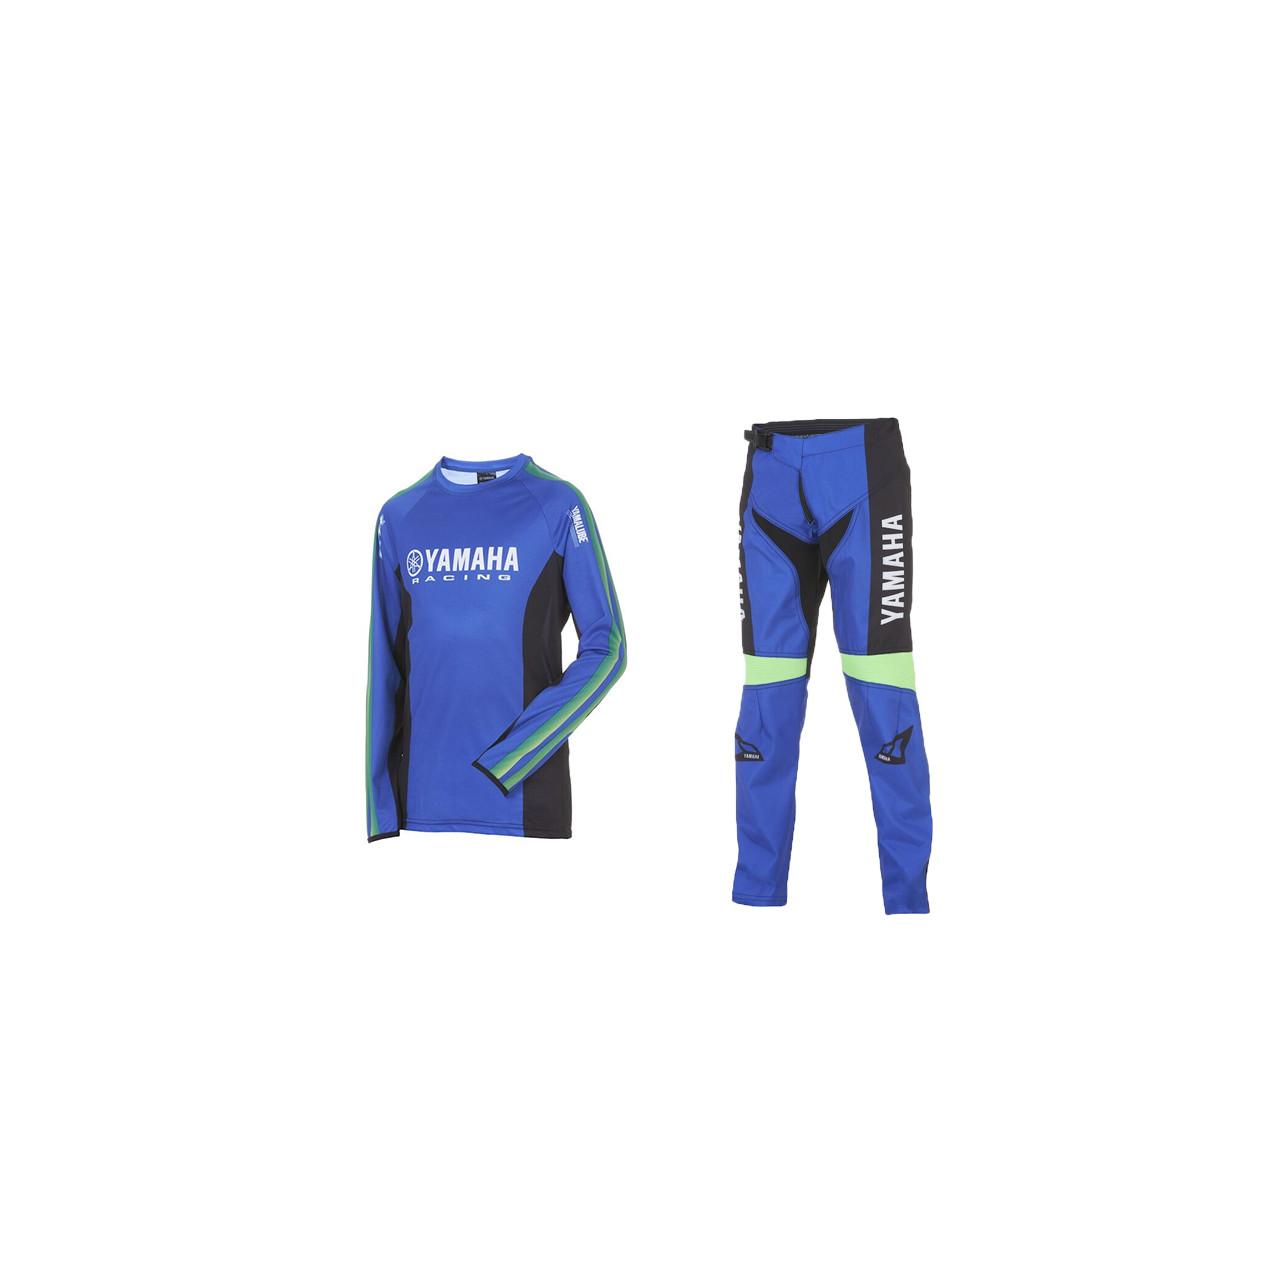 YAMAHA Pack MX junior maillot + pantalon